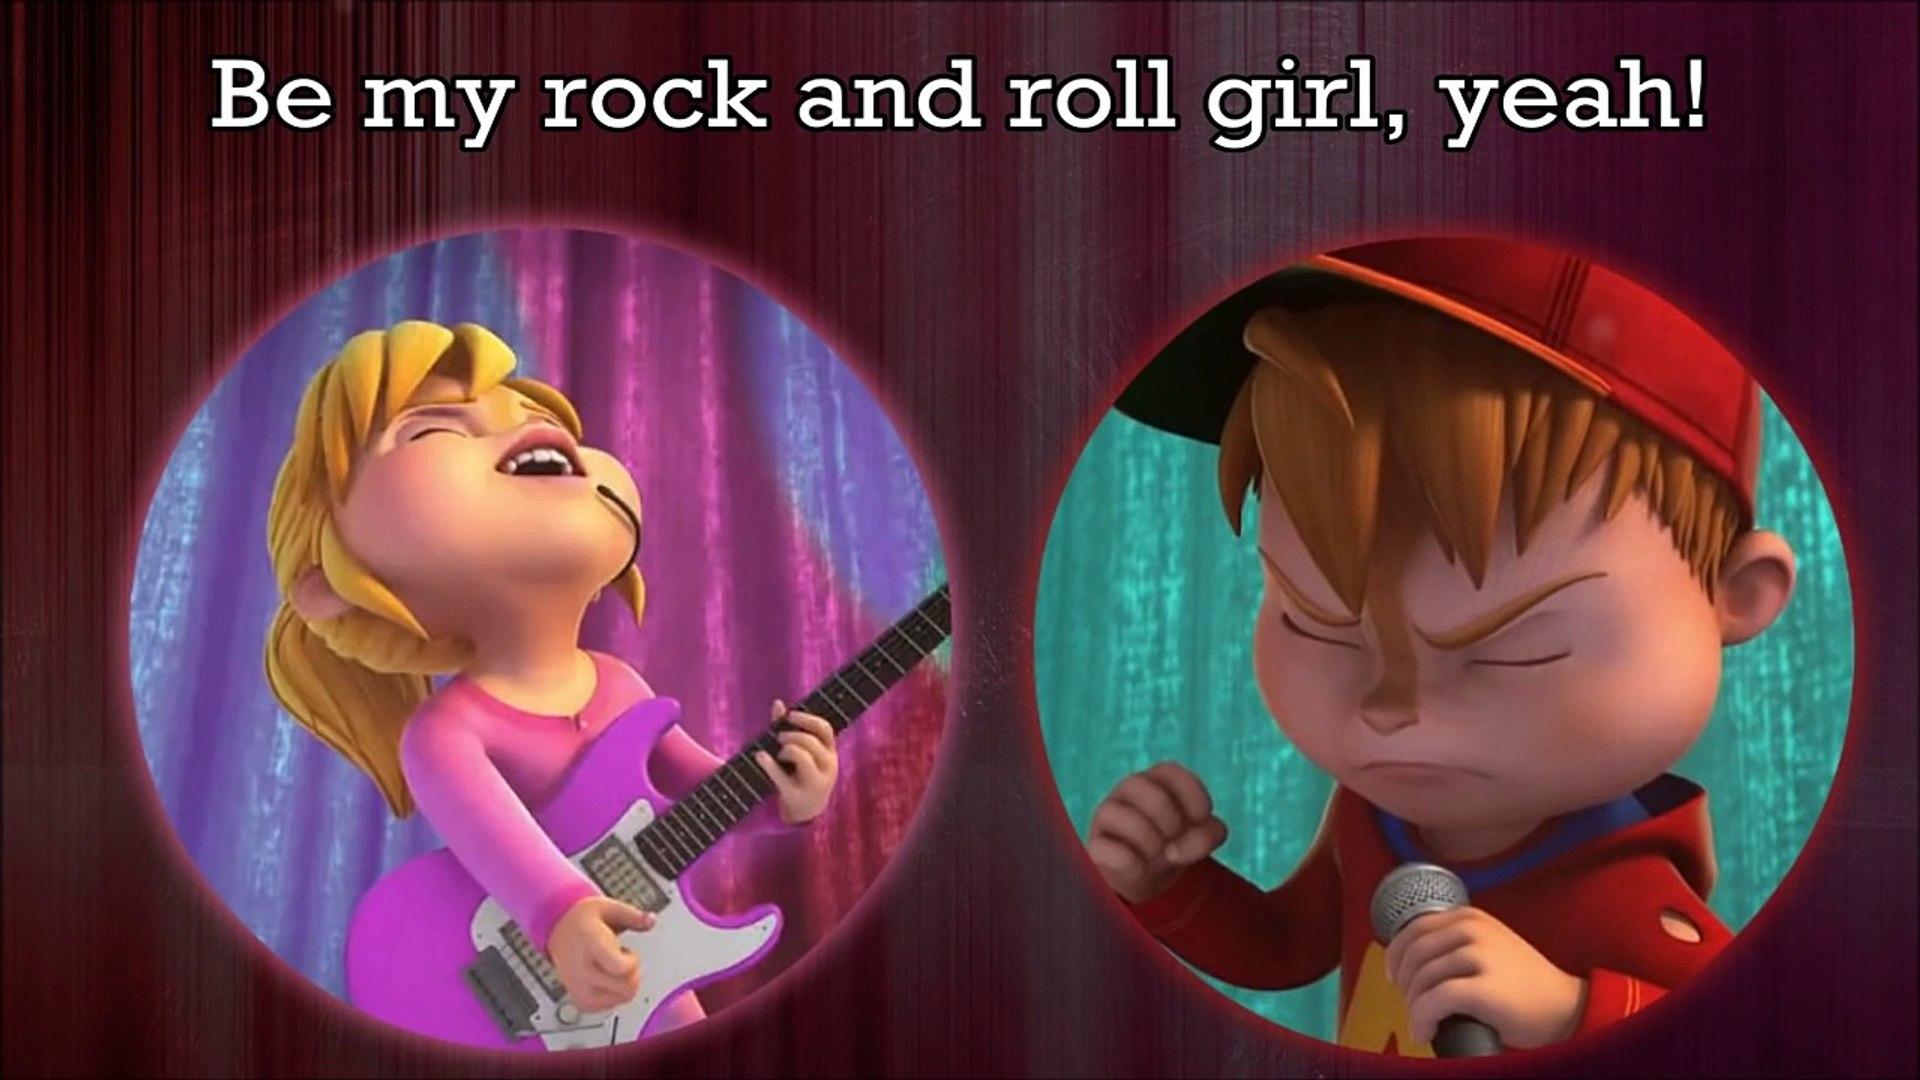 Alvinnn And The Chipmunks Brittany And Alvin rock n roll lover alvin seville and brittany miller lyrics